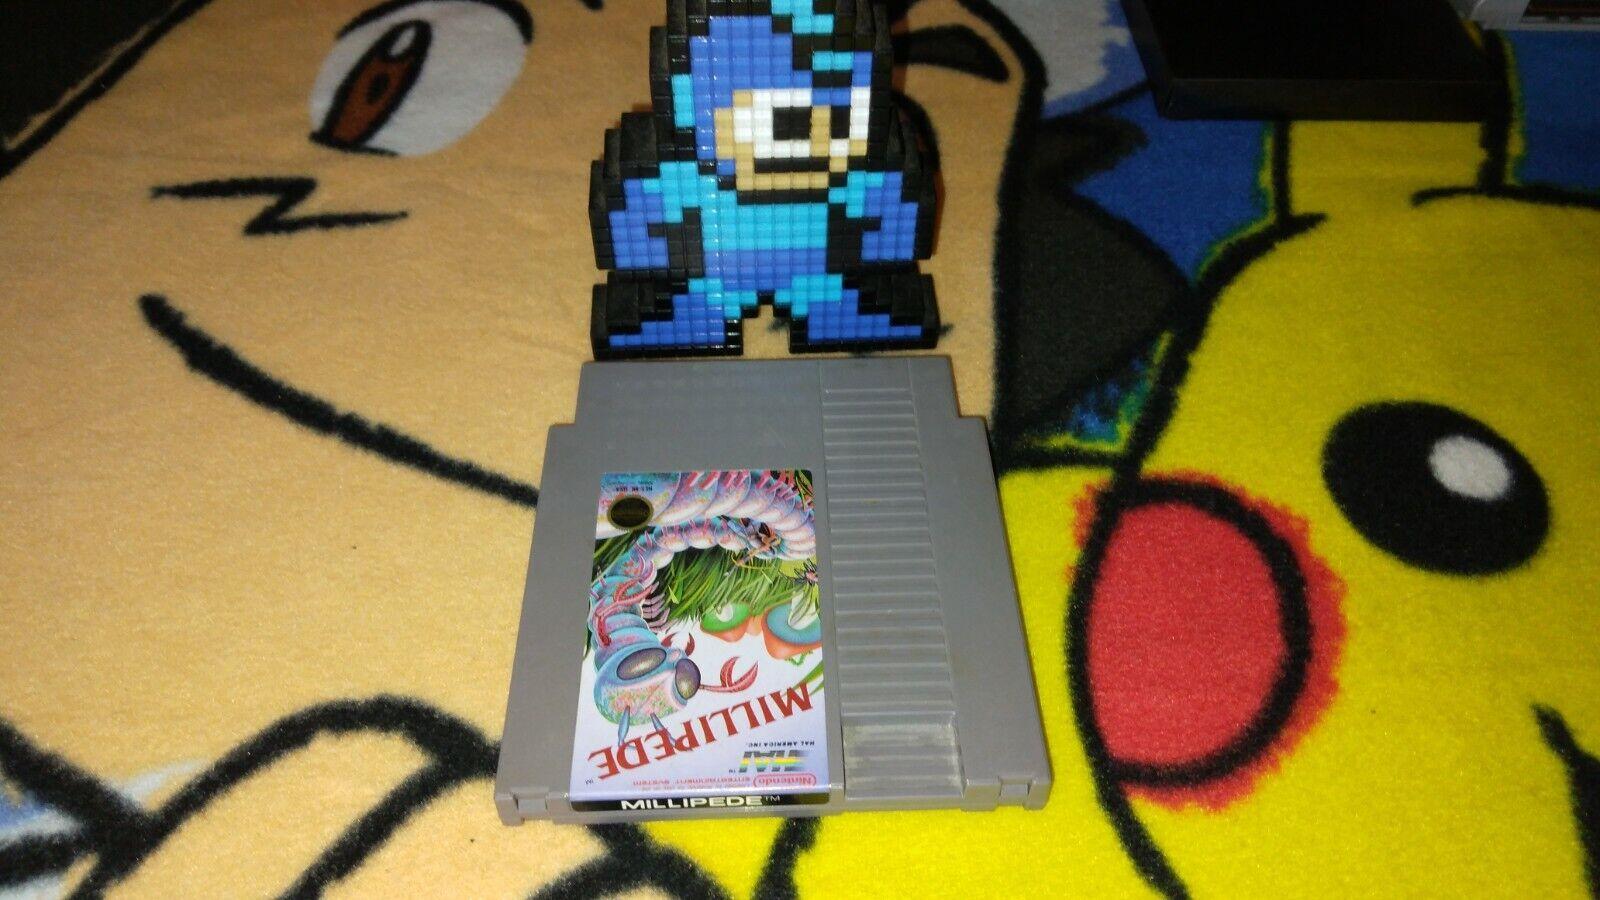 Millipede Nintendo Entertainment System, 1988  - $8.75